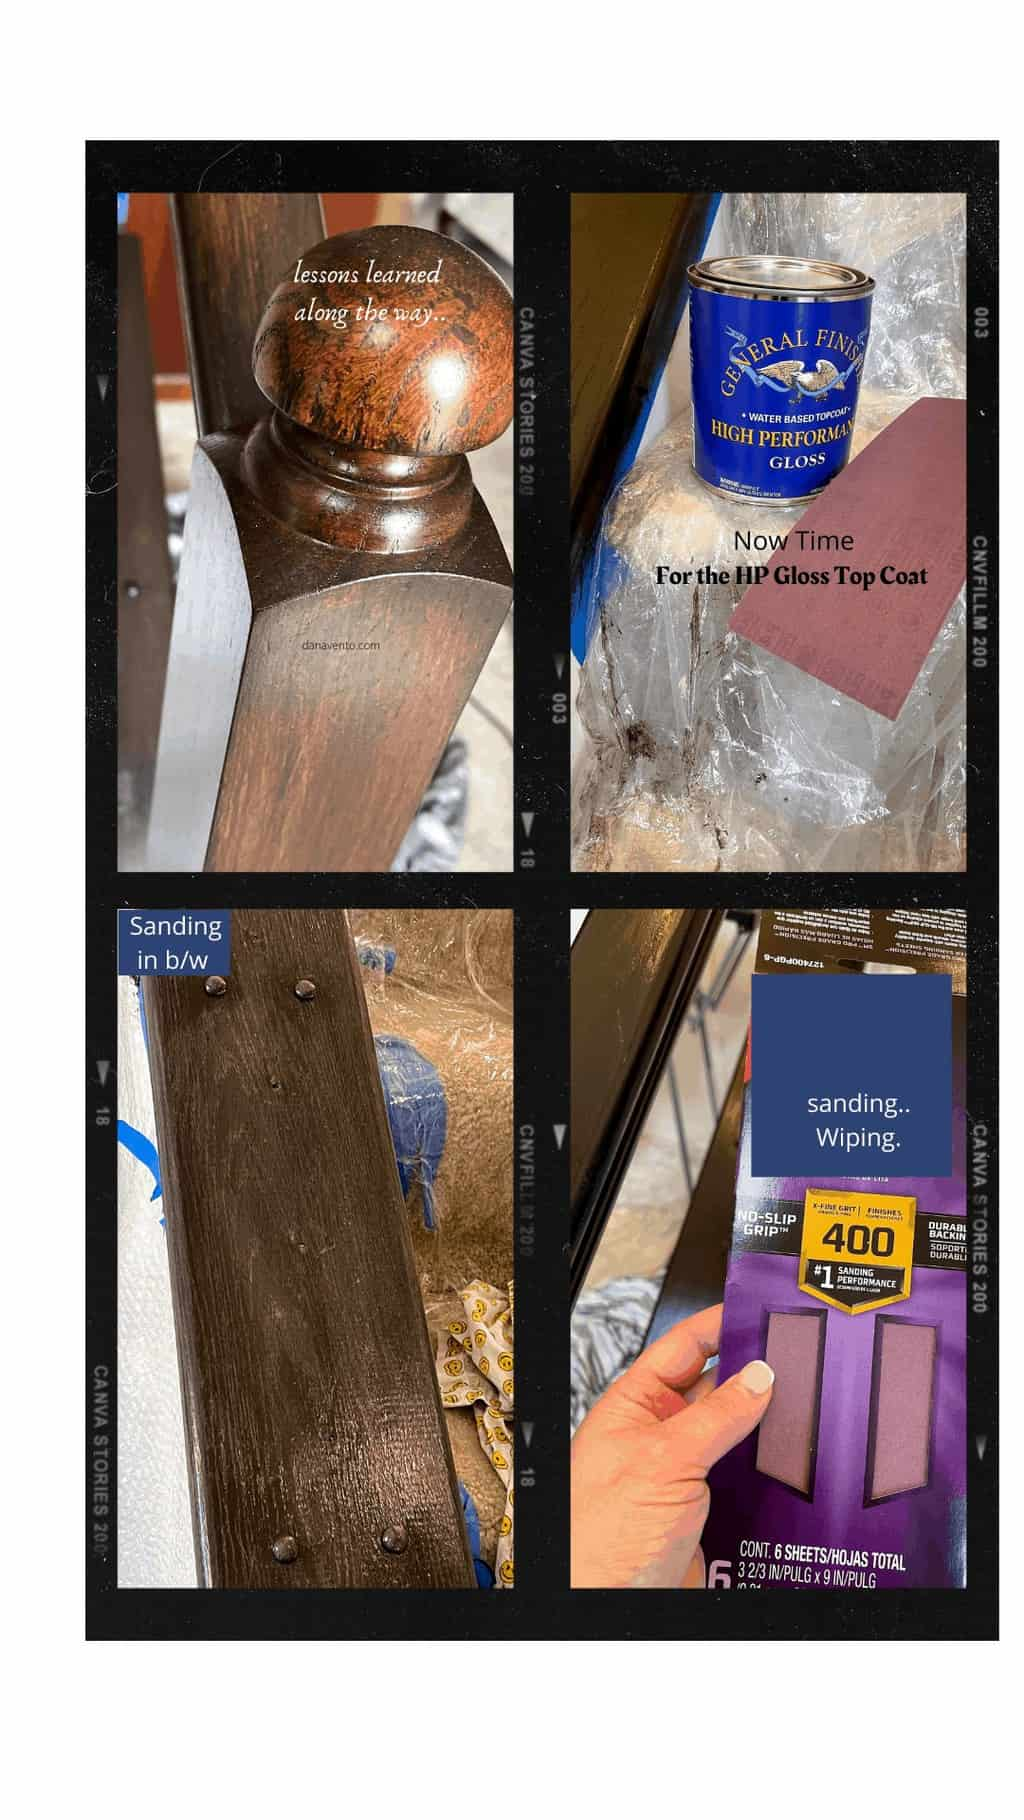 High Performance Gloss DIY on banister stairs DIY